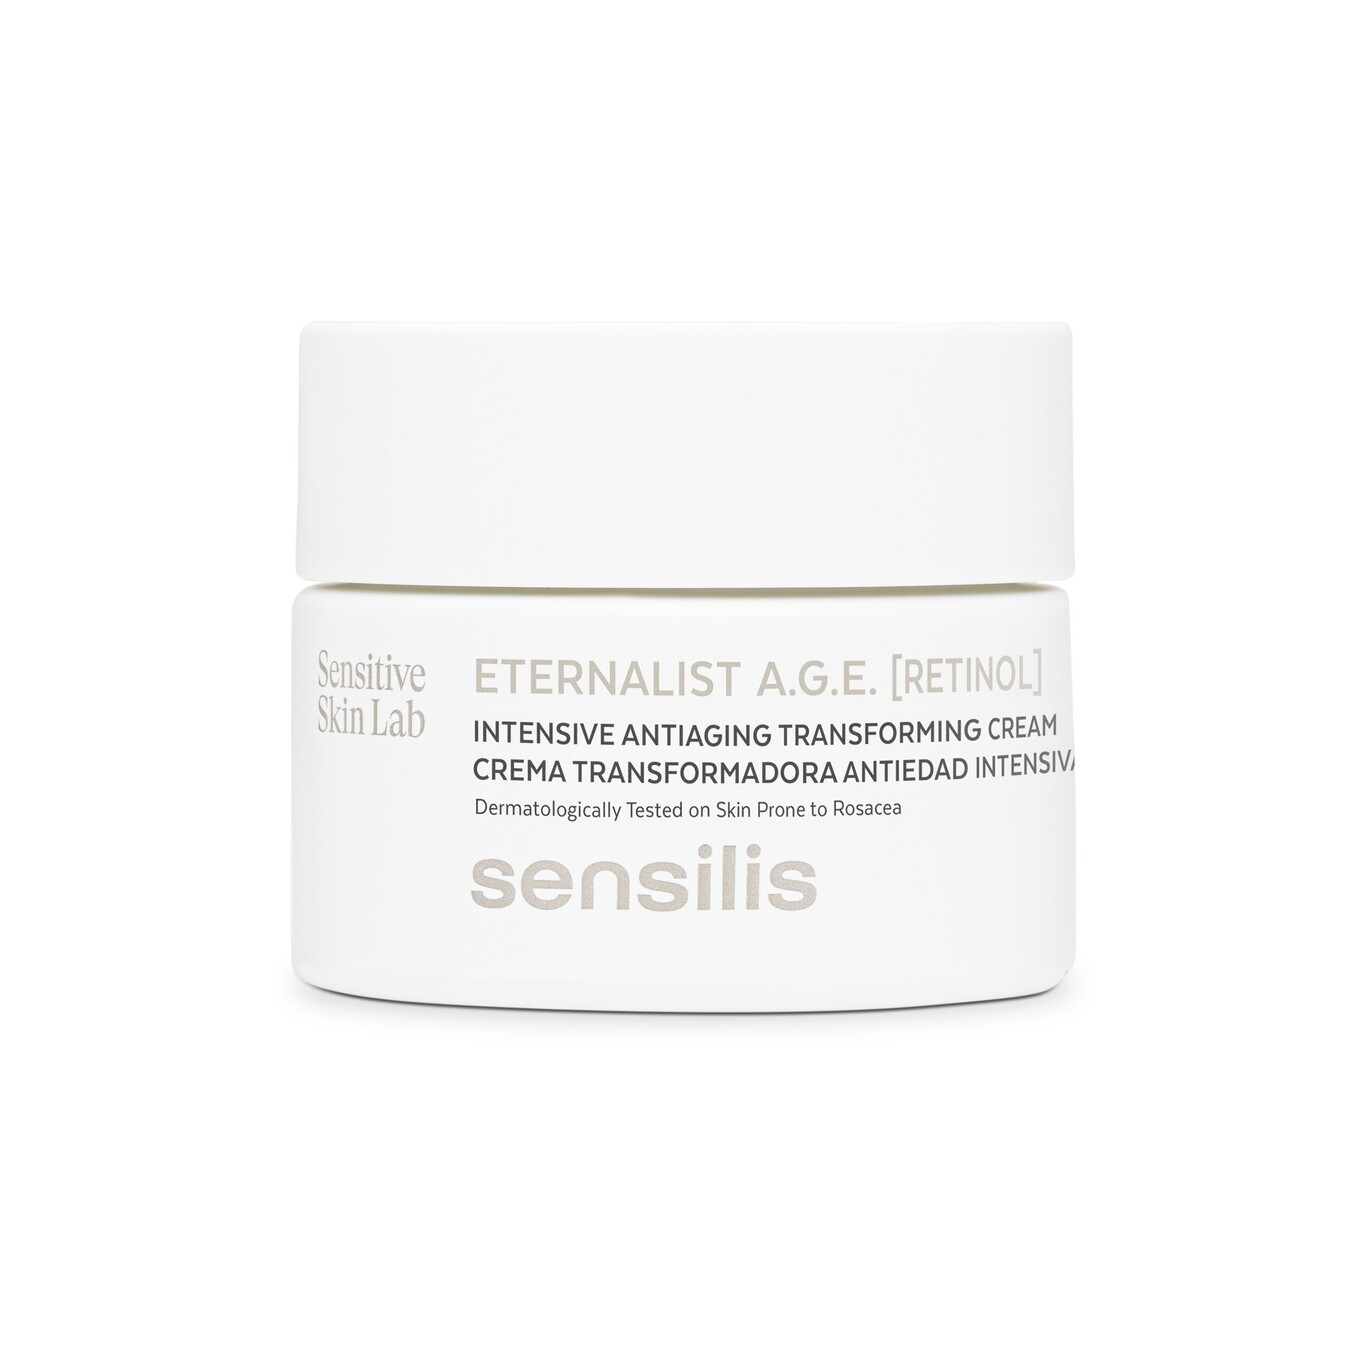 Eternalist A.G.E. [Retinol] Sensilis